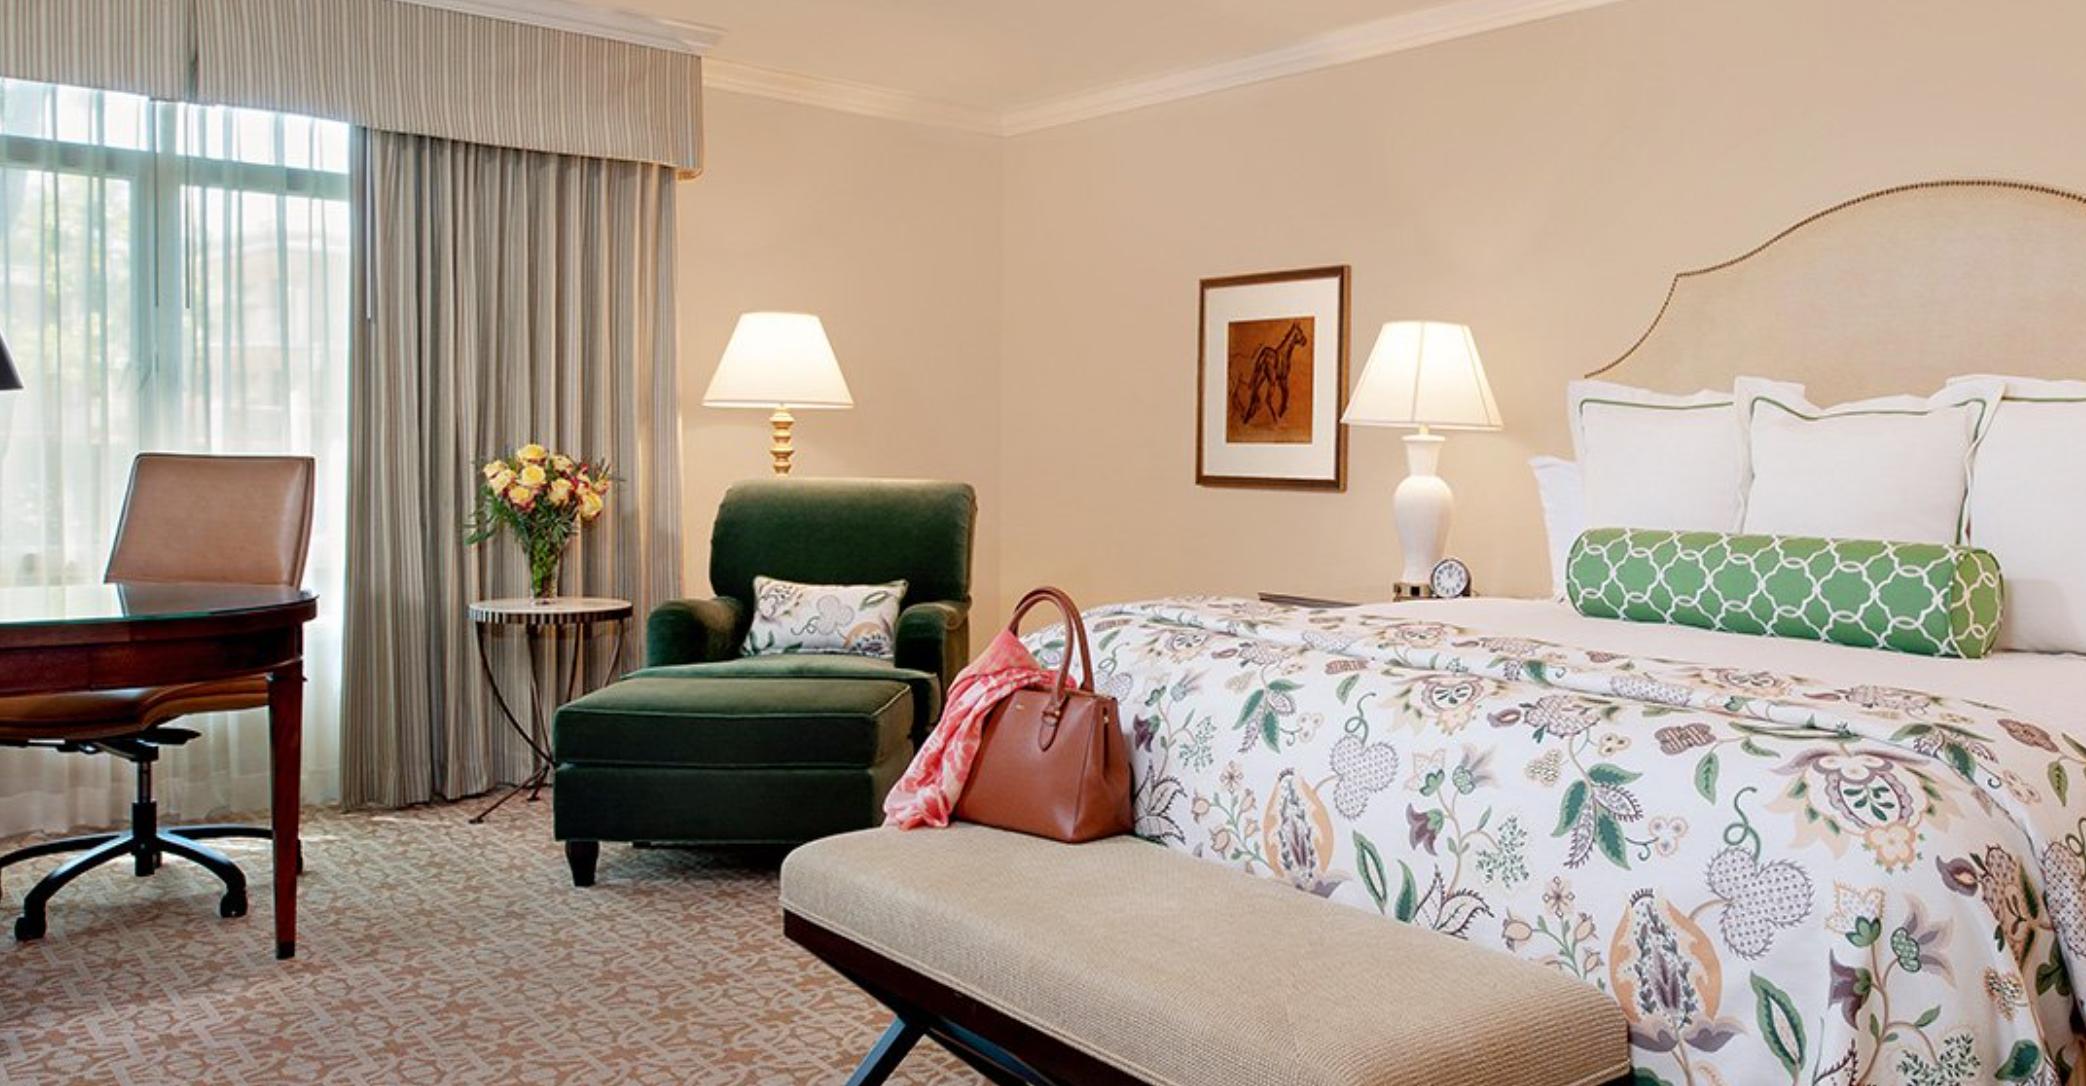 https://www.hotelsbyday.com/_data/default-hotel_image/4/22205/screenshot-2020-10-05-at-7-07-41-pm.png